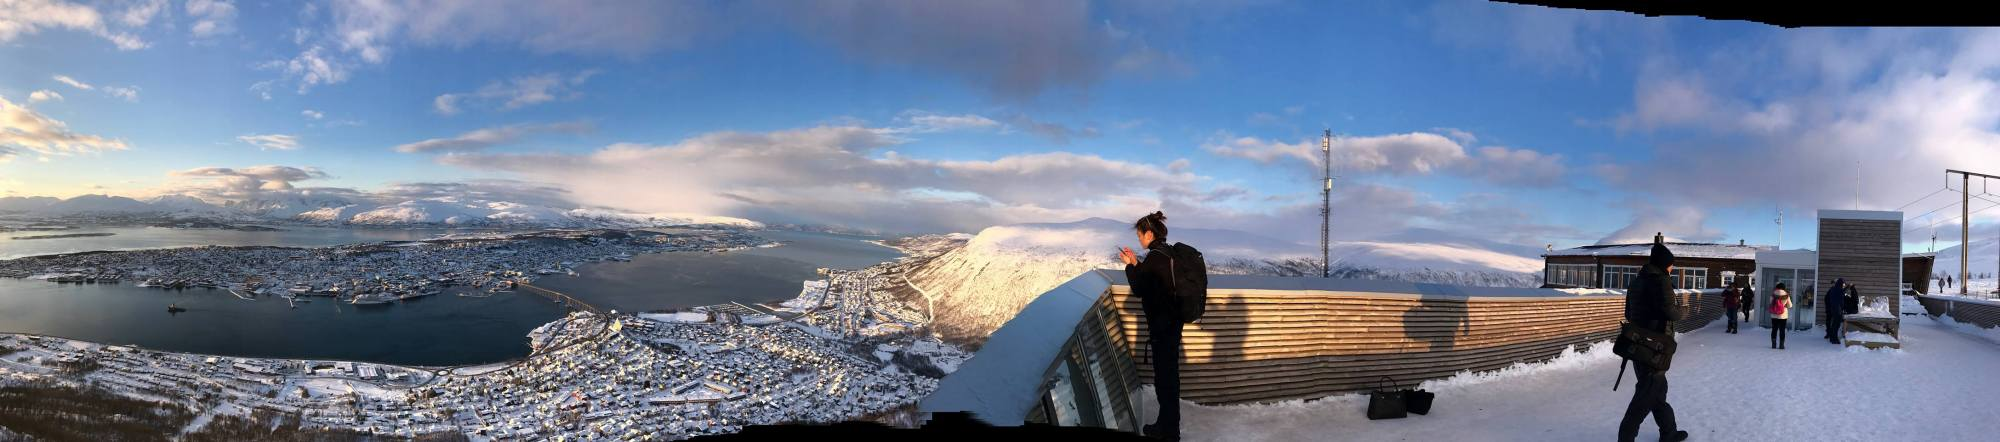 Tromso-panaromic view-giftofparis.com